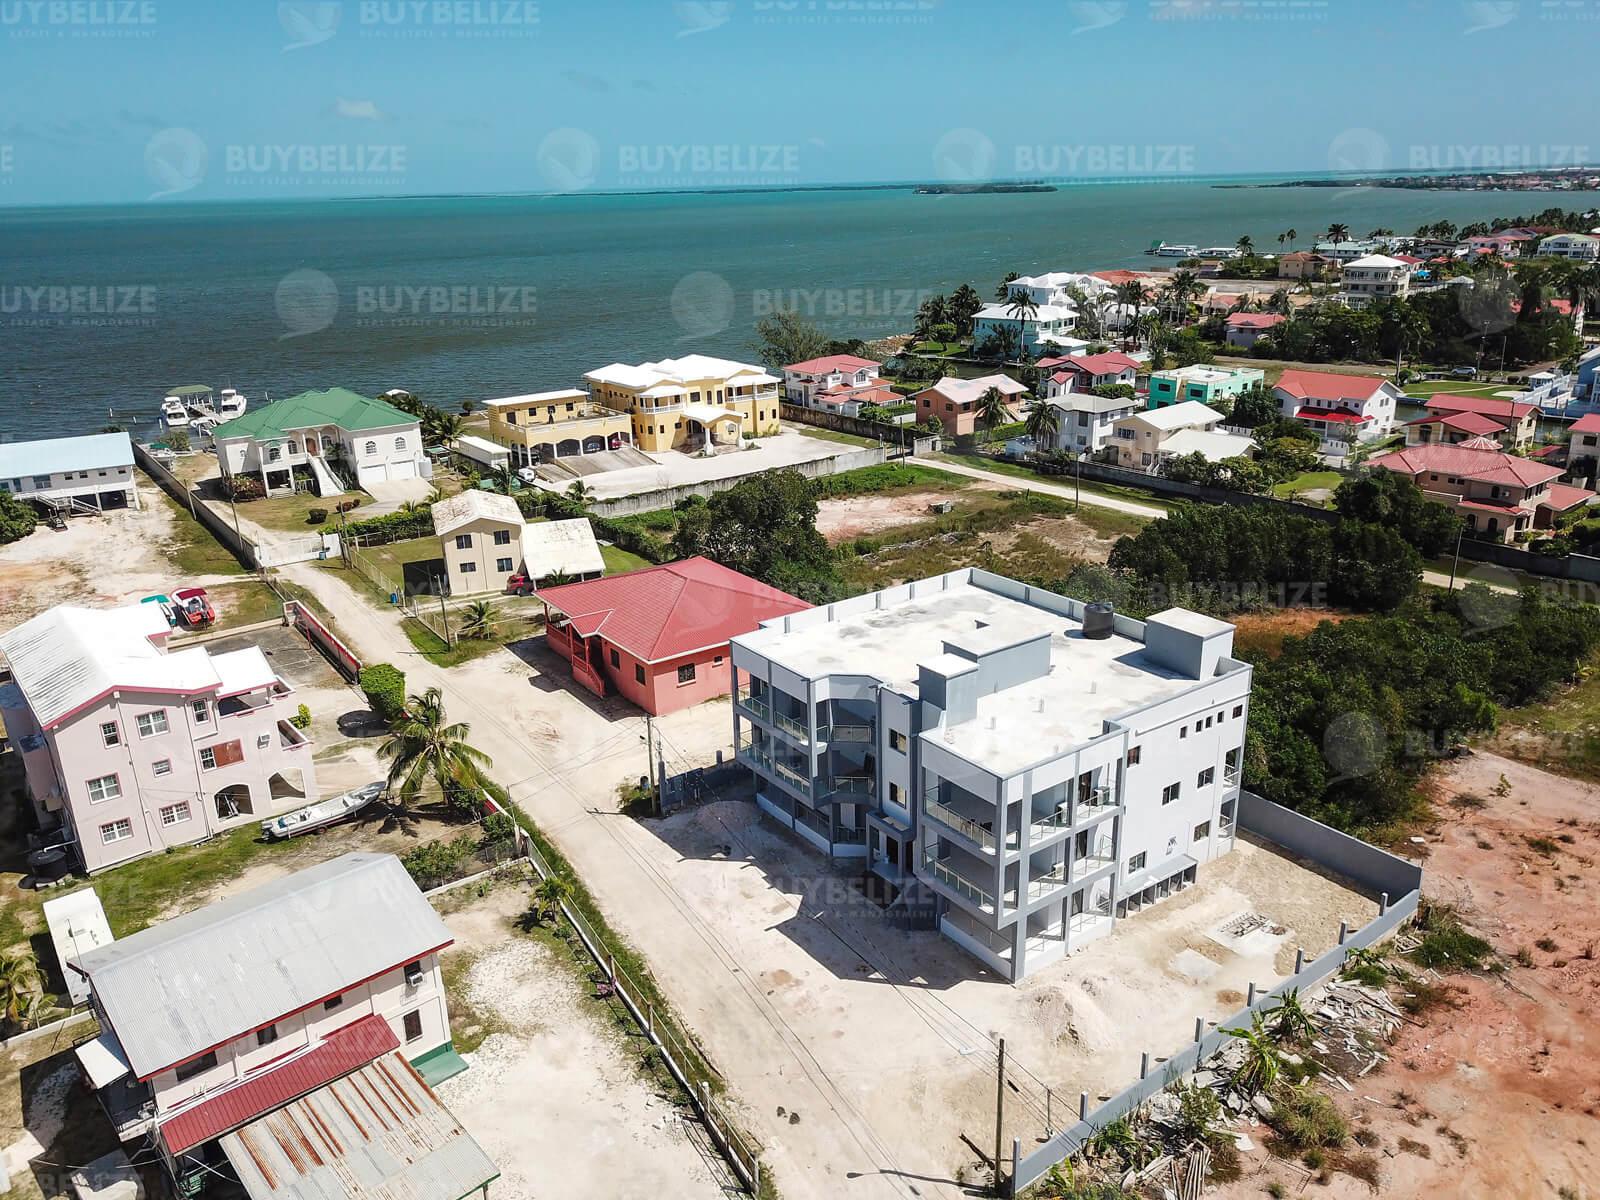 Modern 2 bedroom 2.5 bathroom apartment for Rent in Belize City